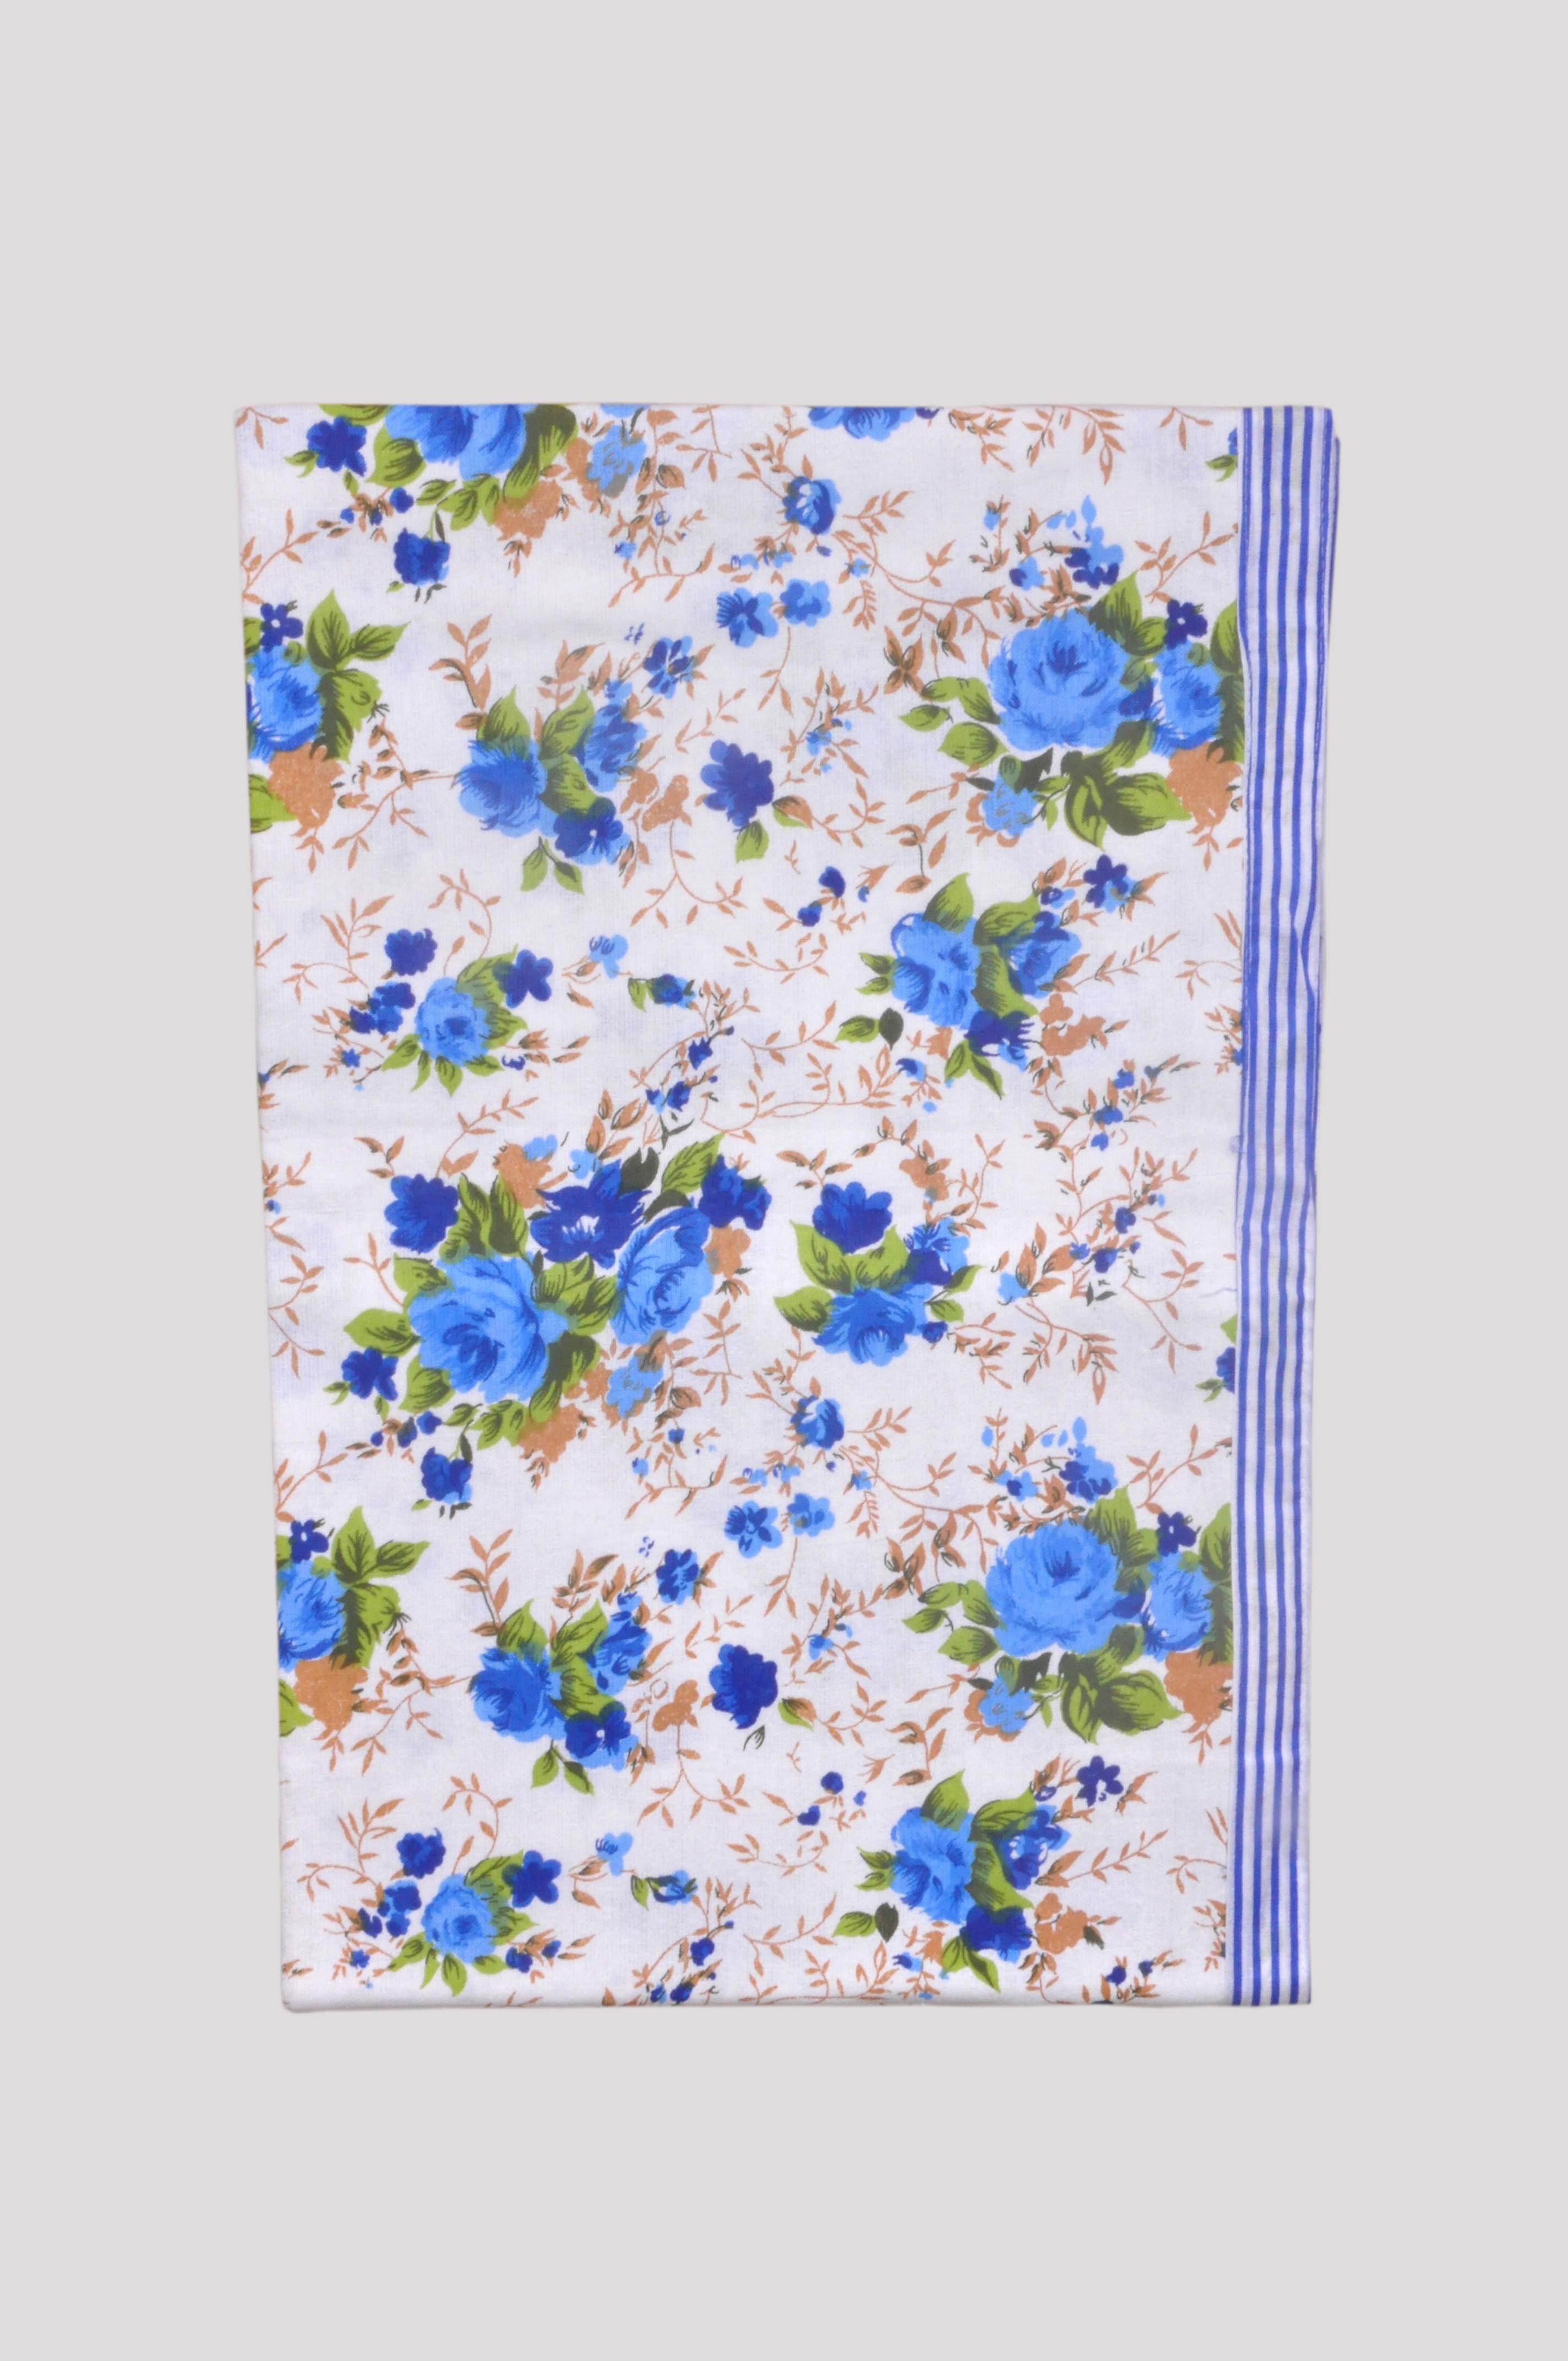 Jass Home Decor Floral Single Blanket Multicolor(Set of 1pc Blanket)